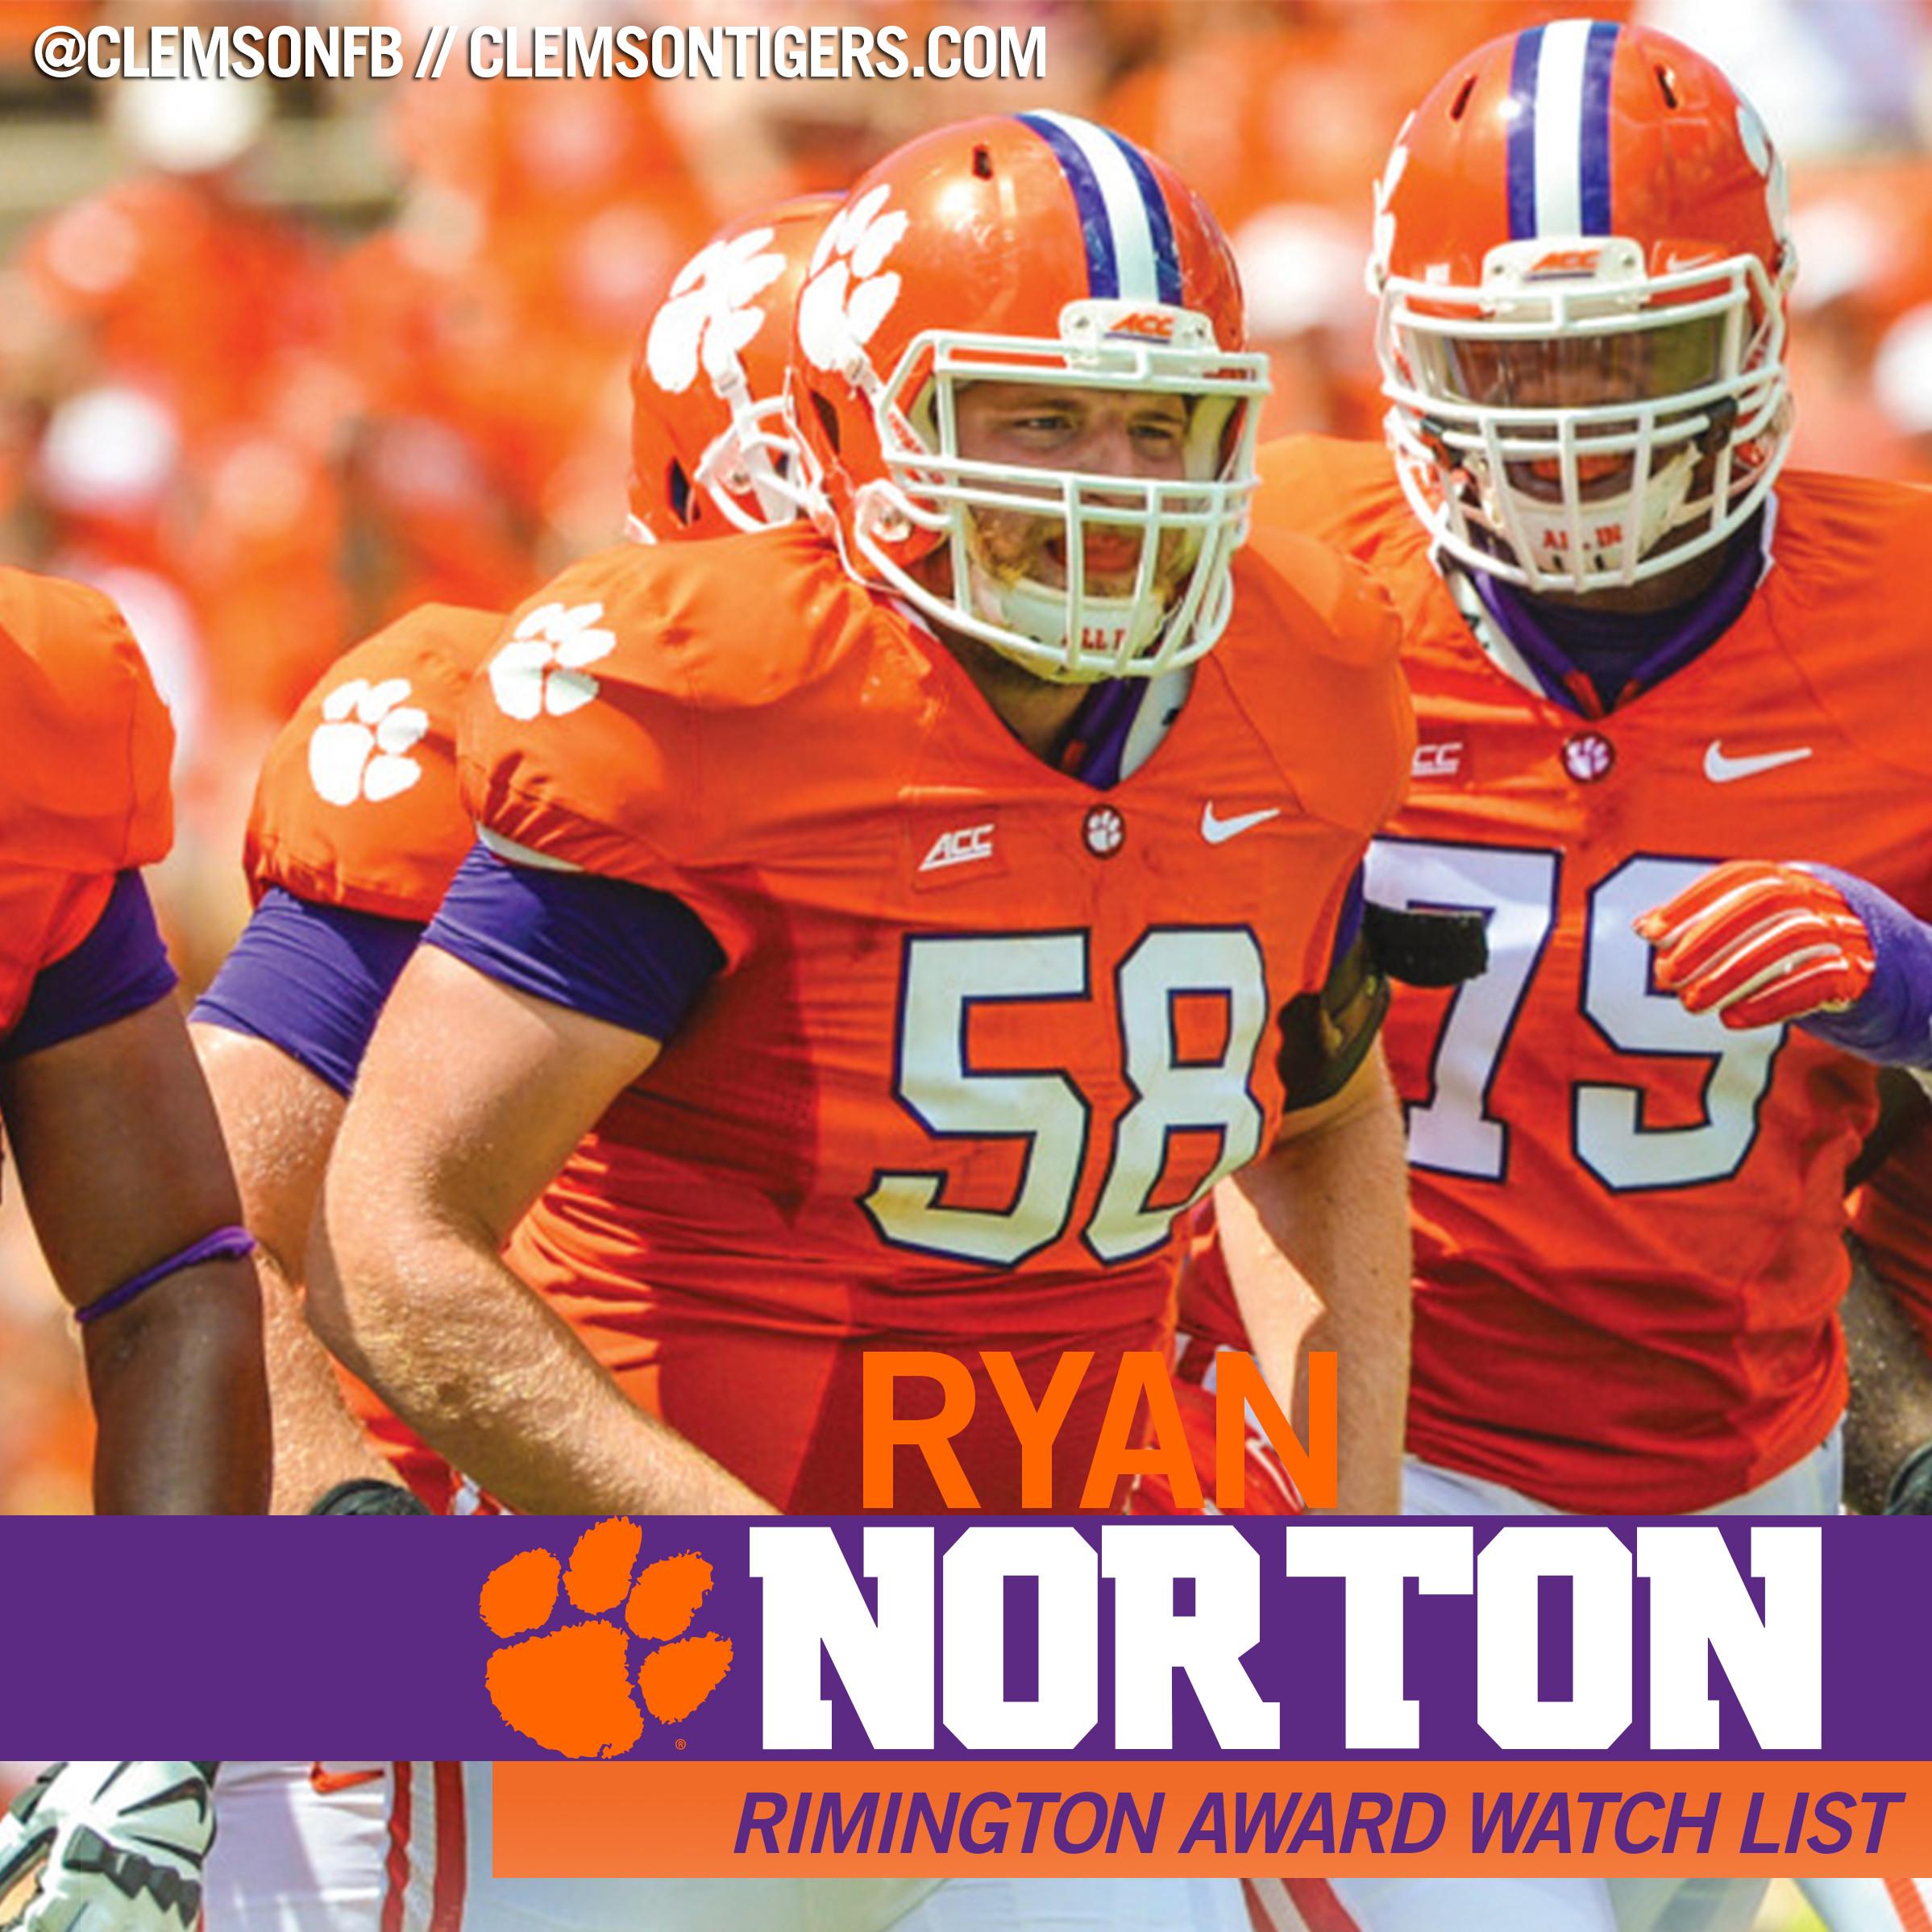 Norton Named to Rimington Watch List